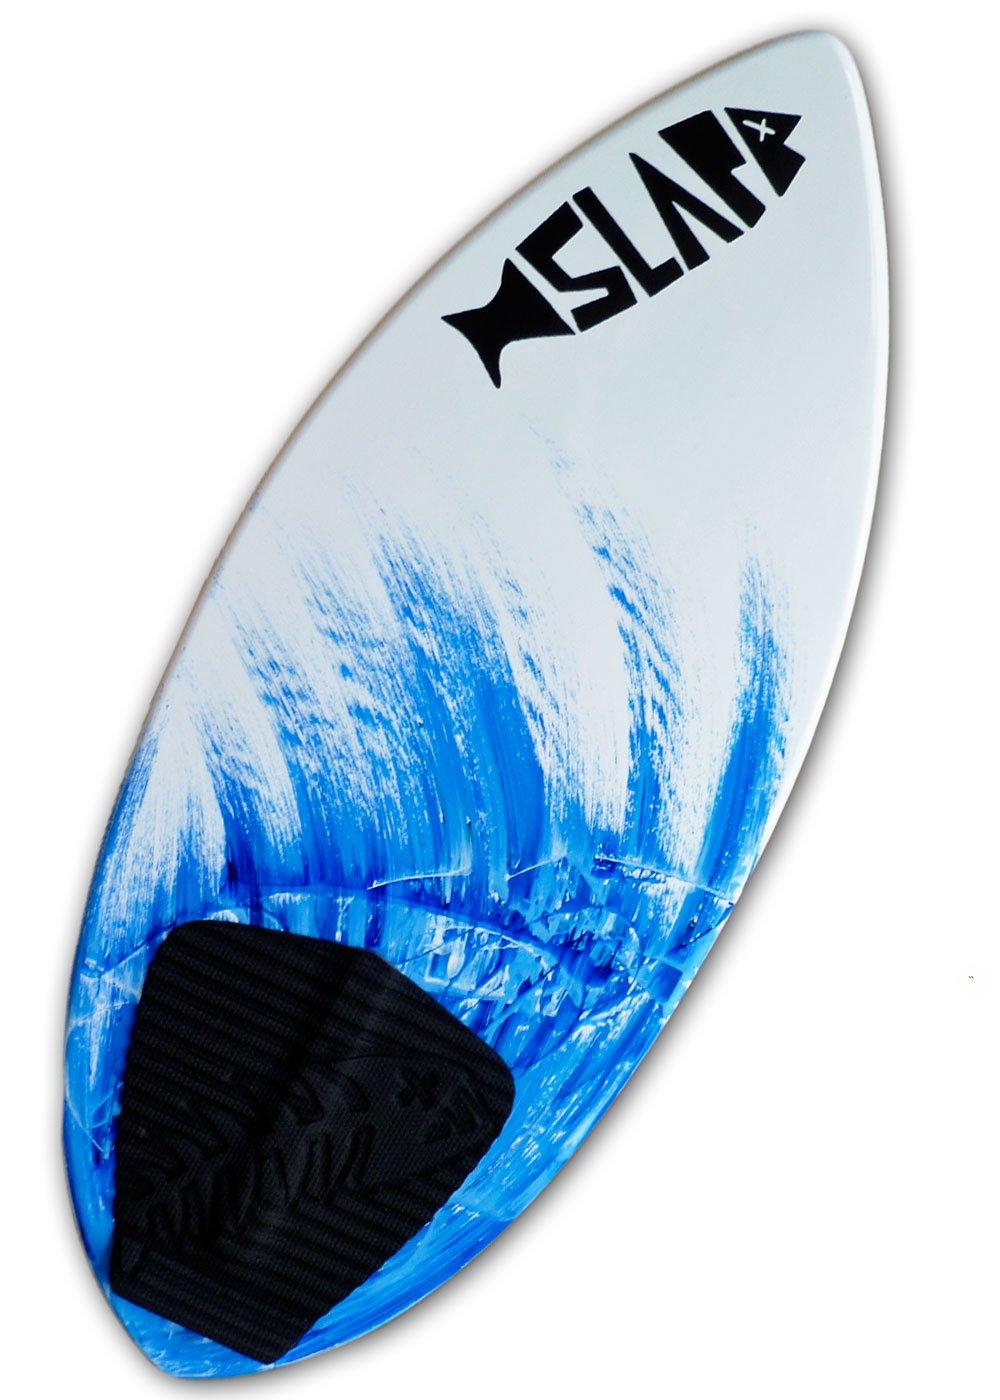 Slapfish Skimboards - Fiberglass & Carbon with Traction Deck Grip - Kids & Adults - 2 Sizes - Blue (52'' Board)